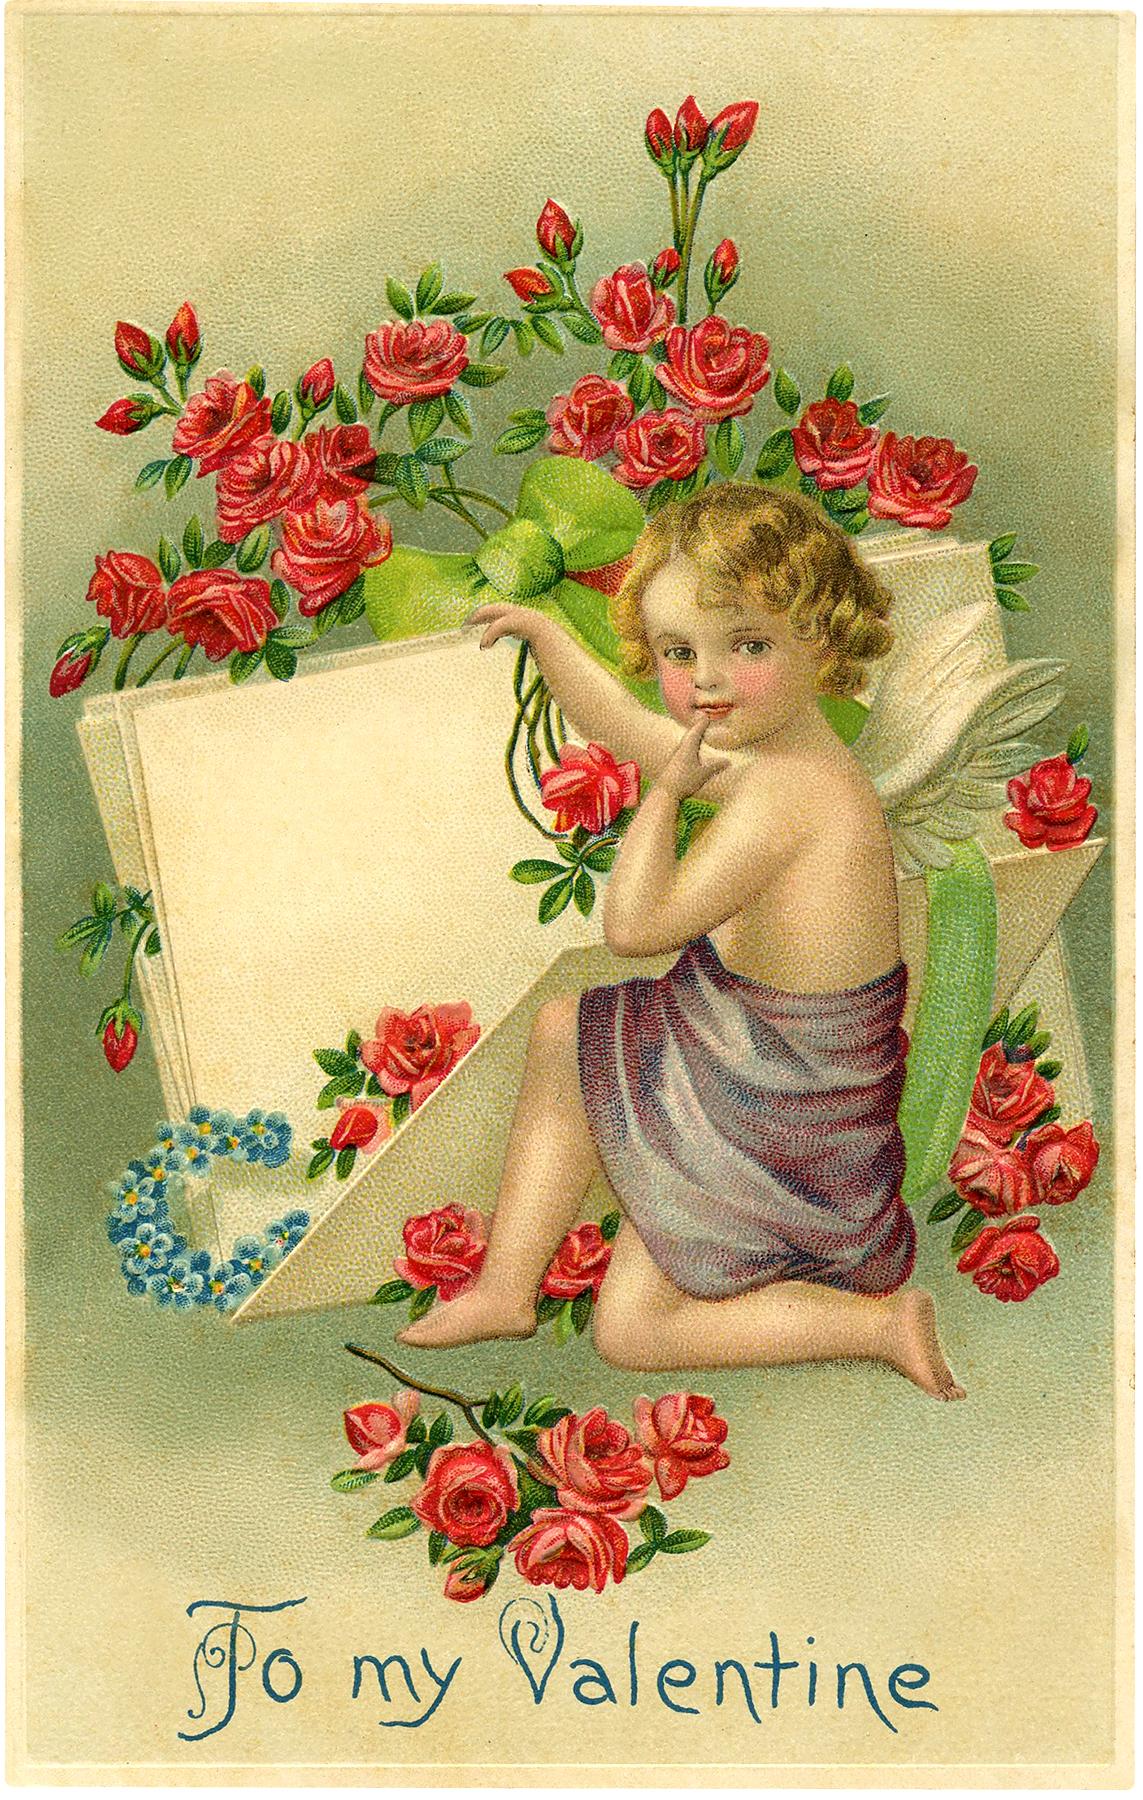 Valentine Roses Cherub Image